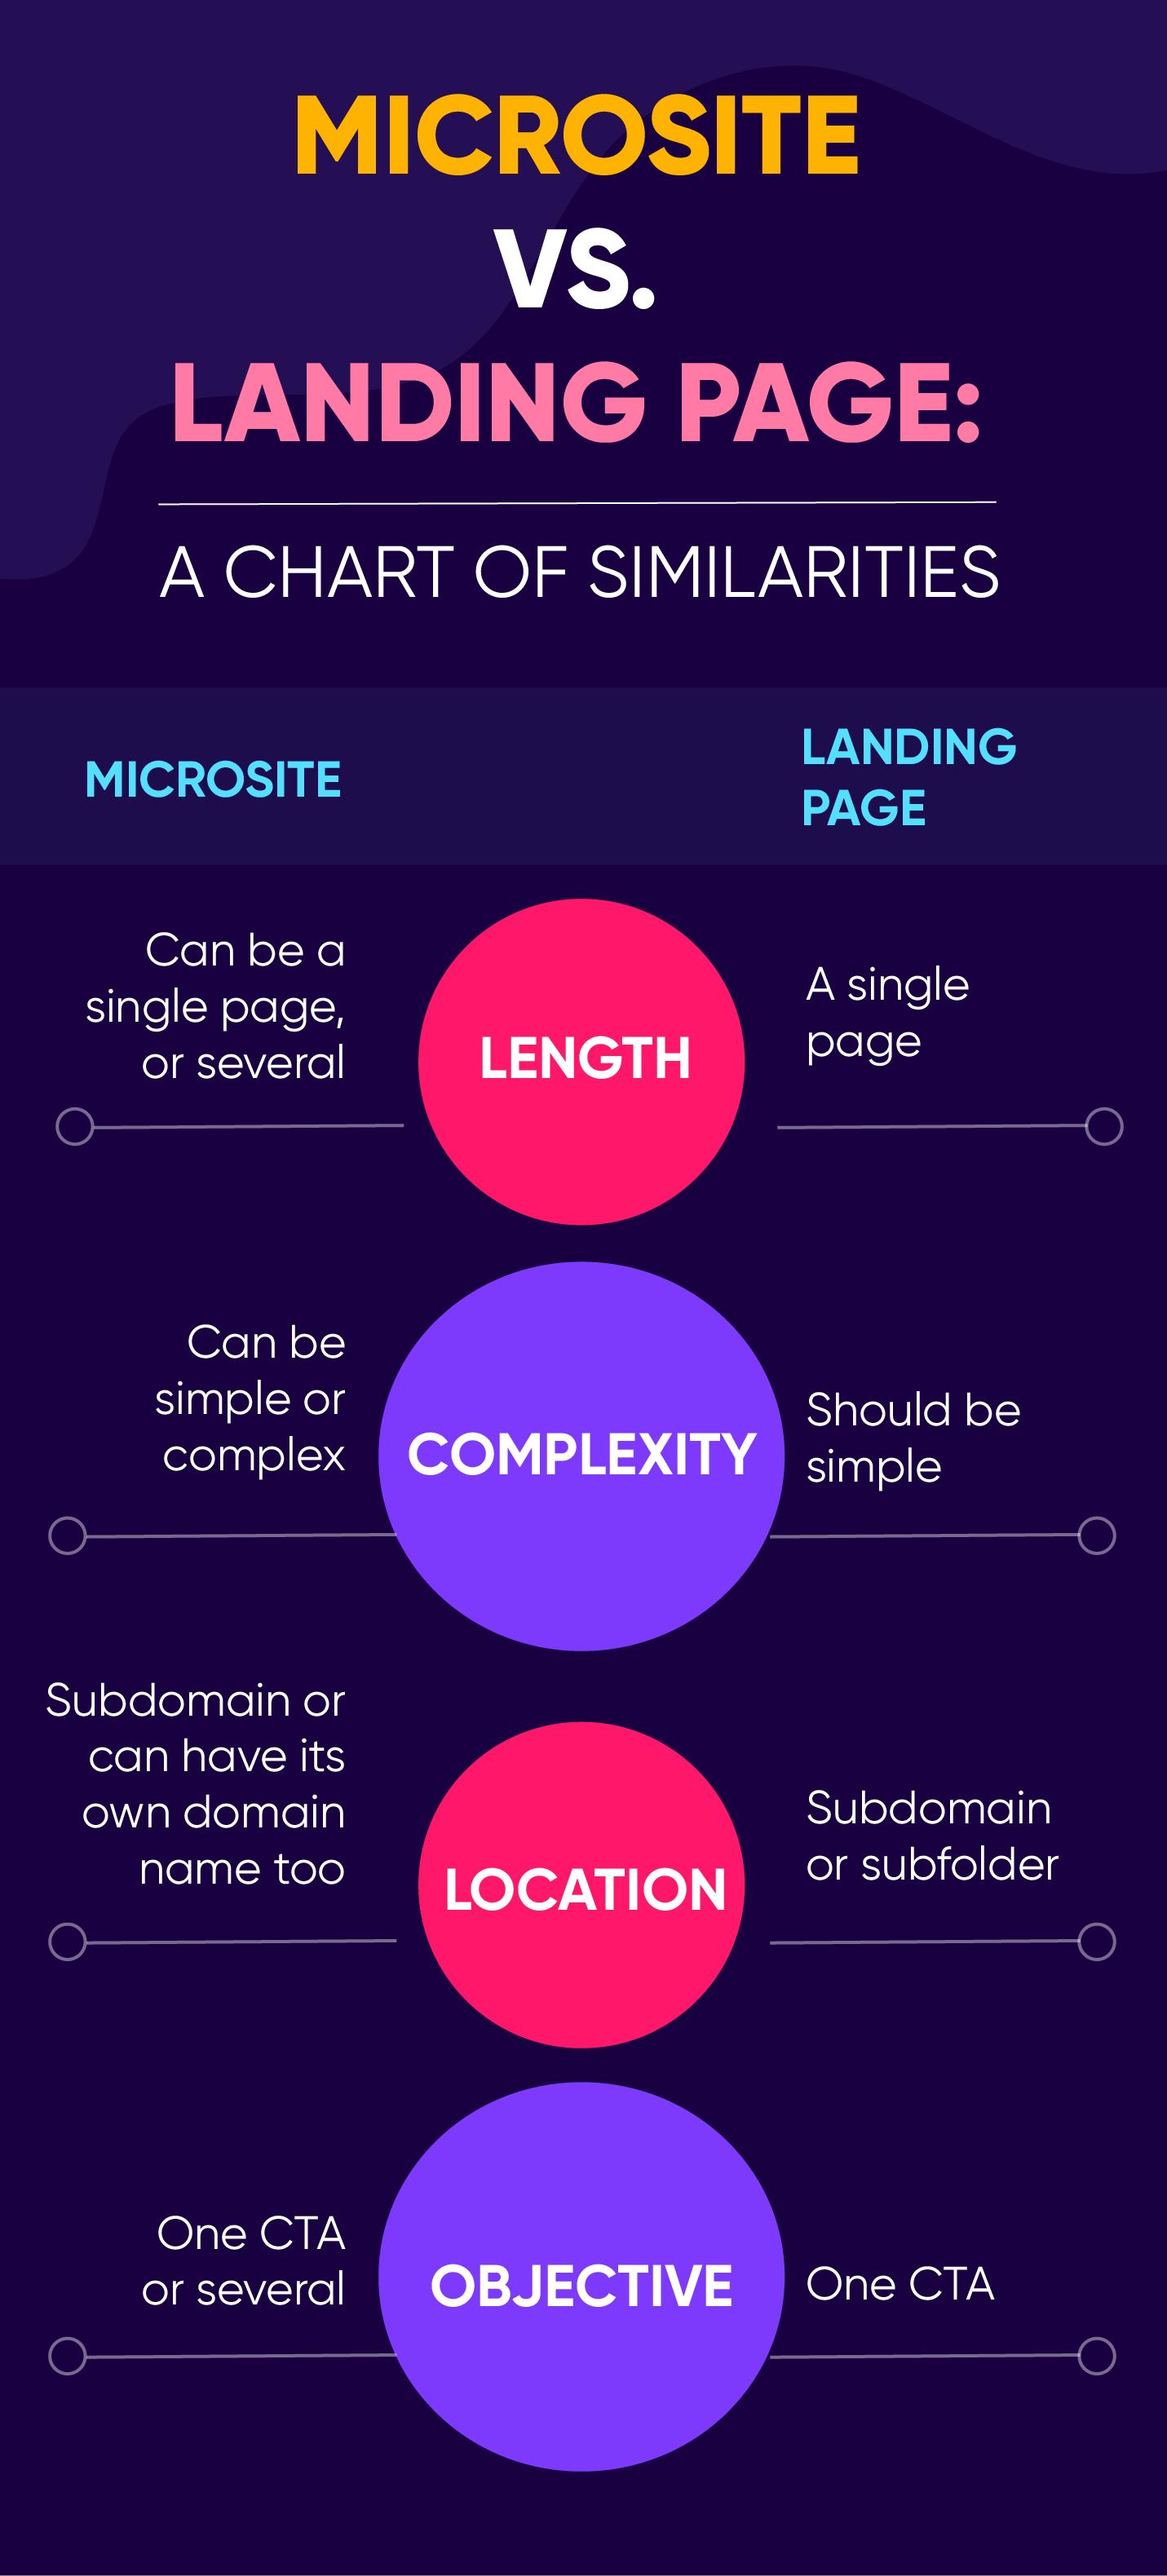 Microsite vs landing page - comparison chart